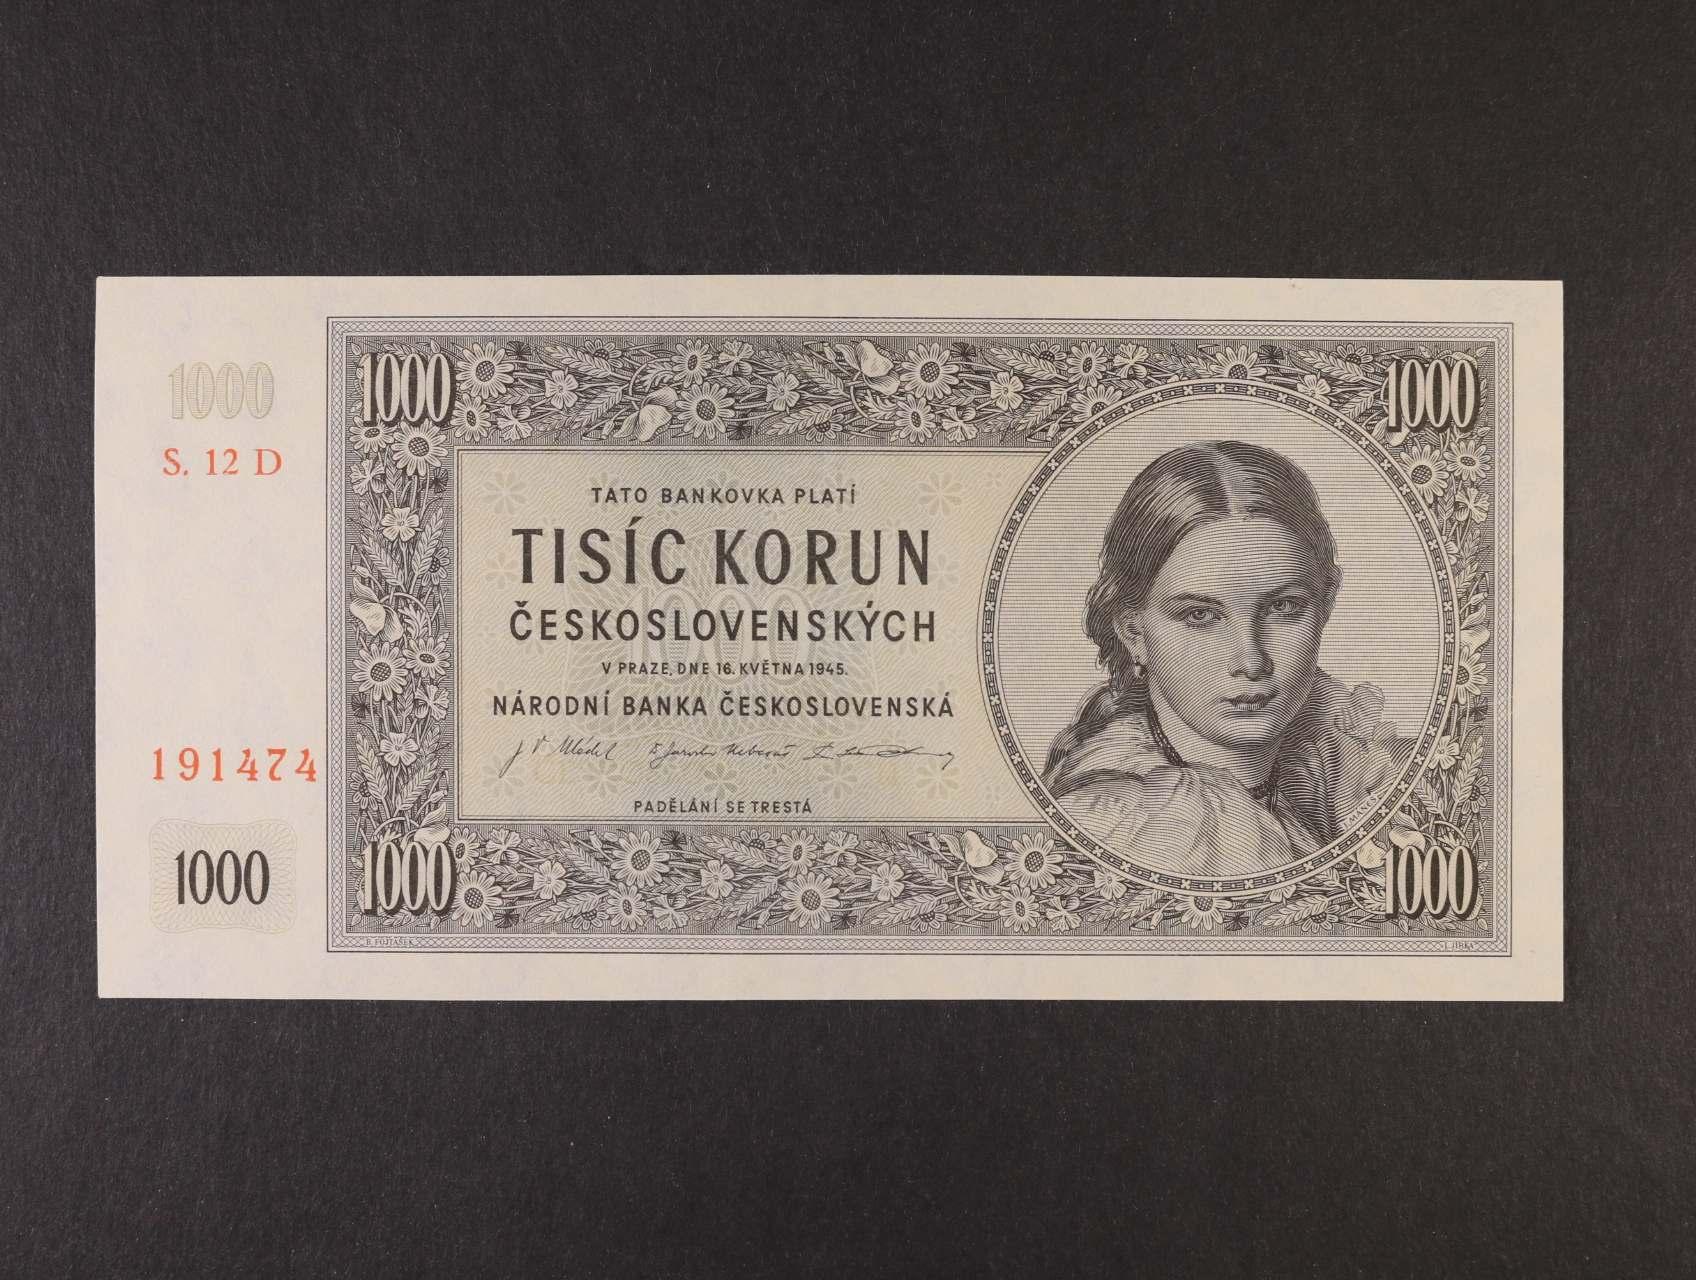 1000 Kčs 16.5.1945 série 12 D, Ba. 78c2, Pi. 74a